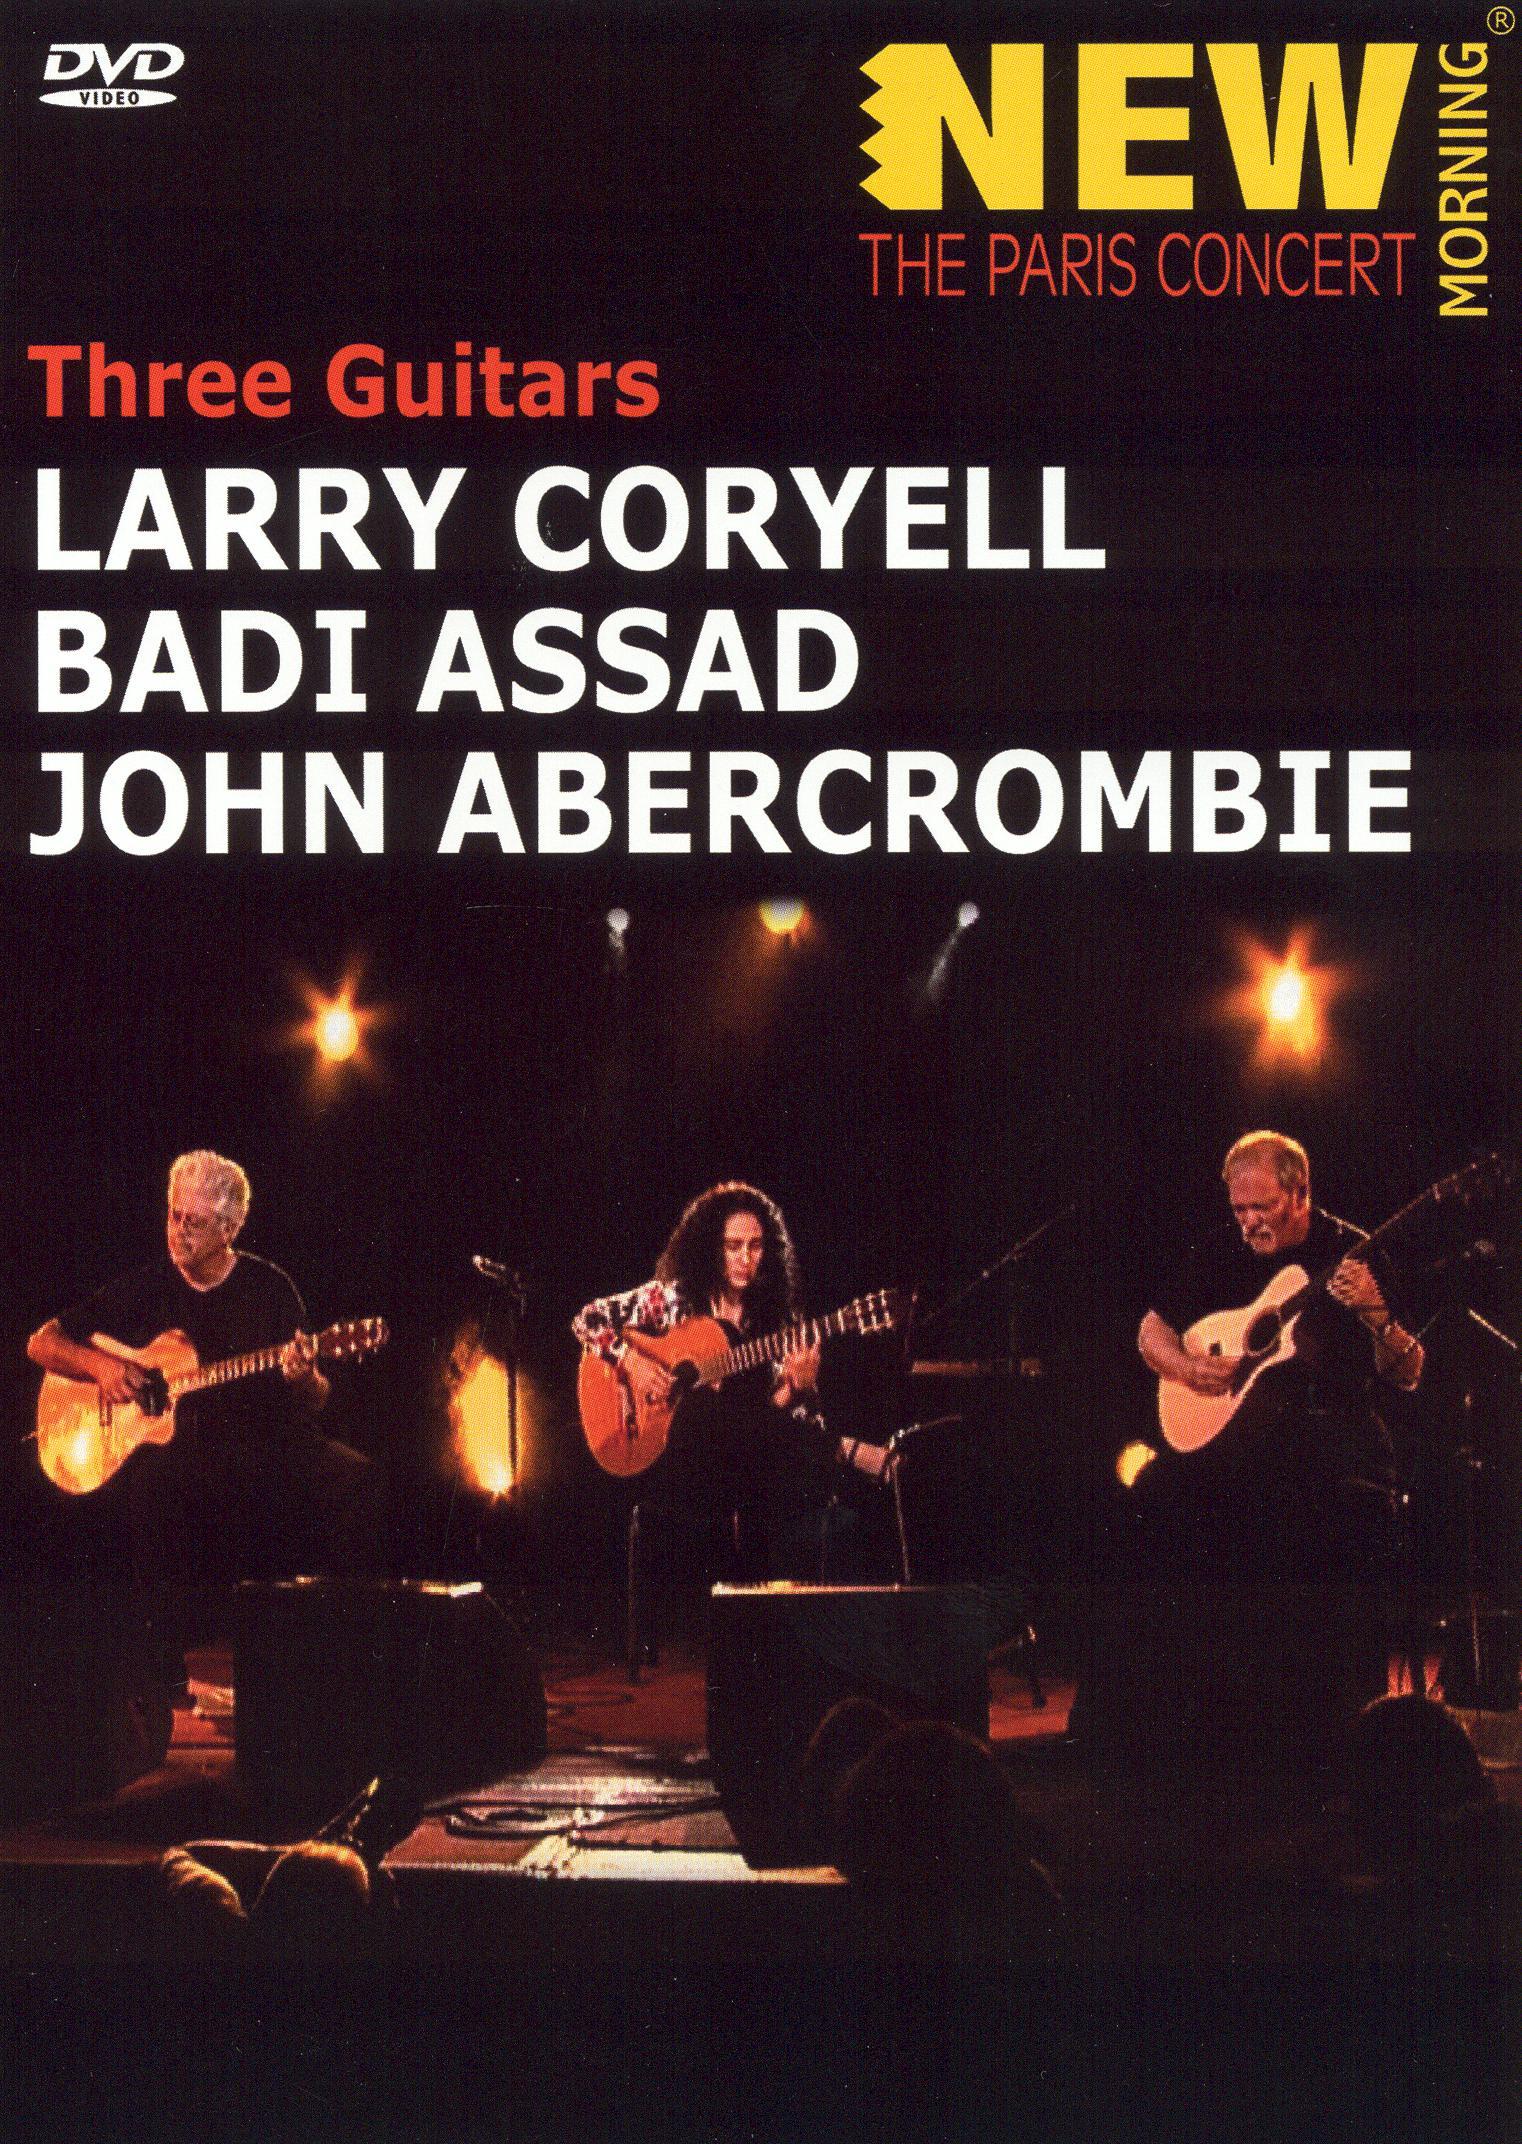 Larry Coryell, Badi Assad and John Abercrombie: Three Guitars - Paris Concert